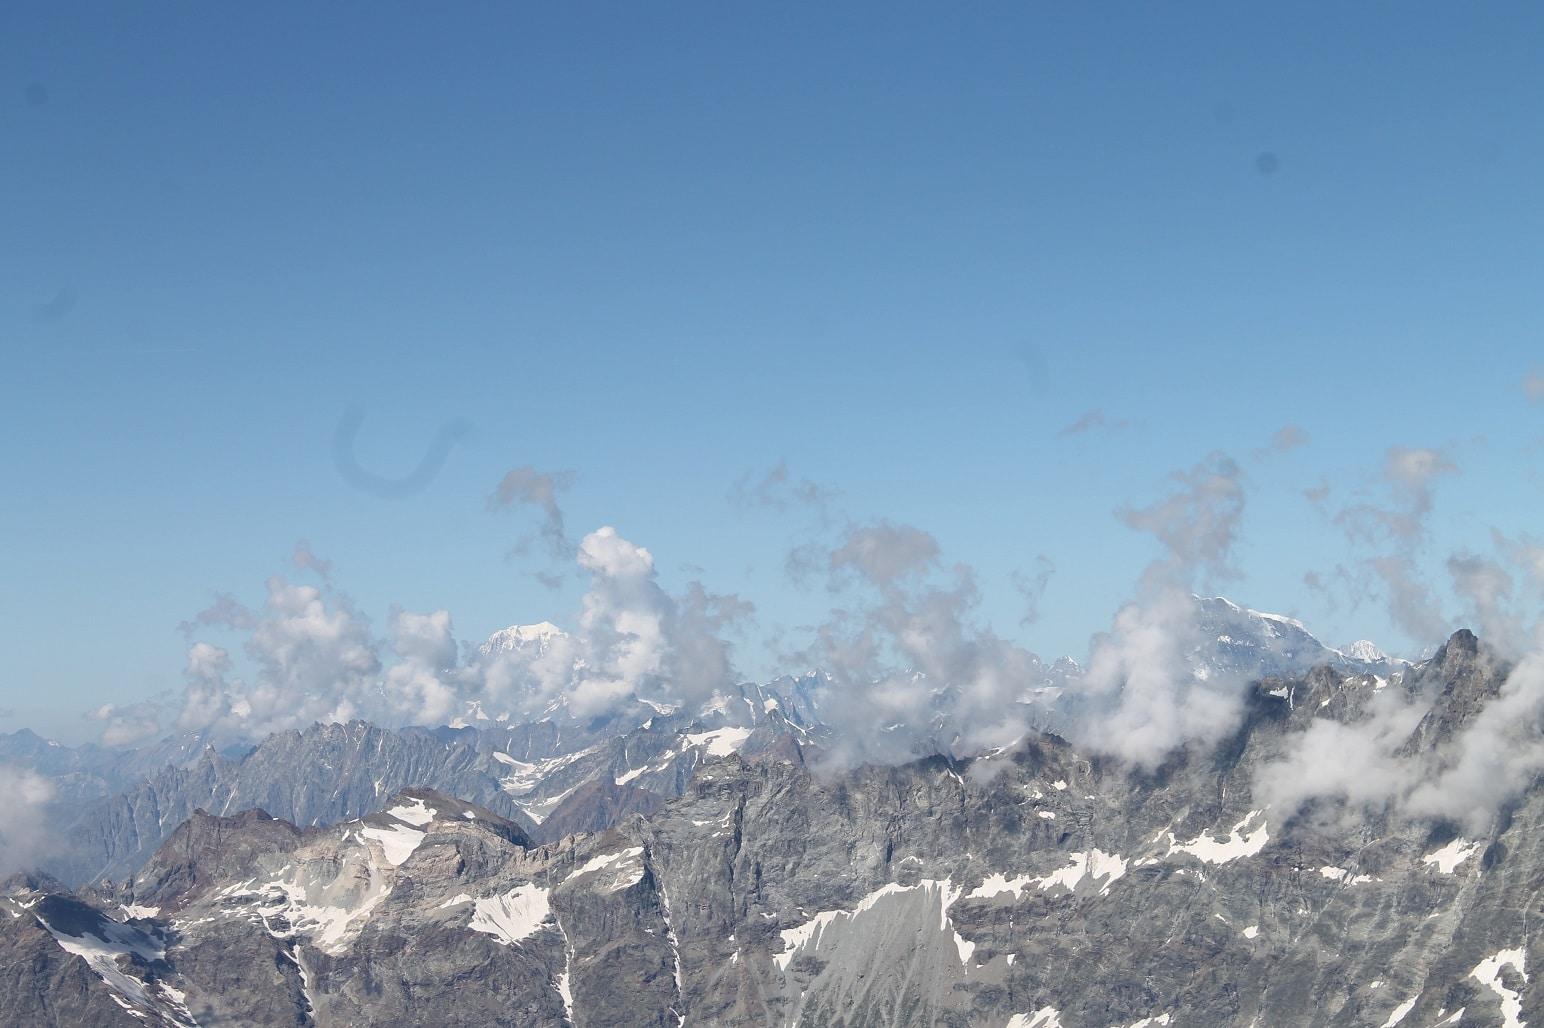 zermatt_panorama_matterhorn_glacier_paradise (1)